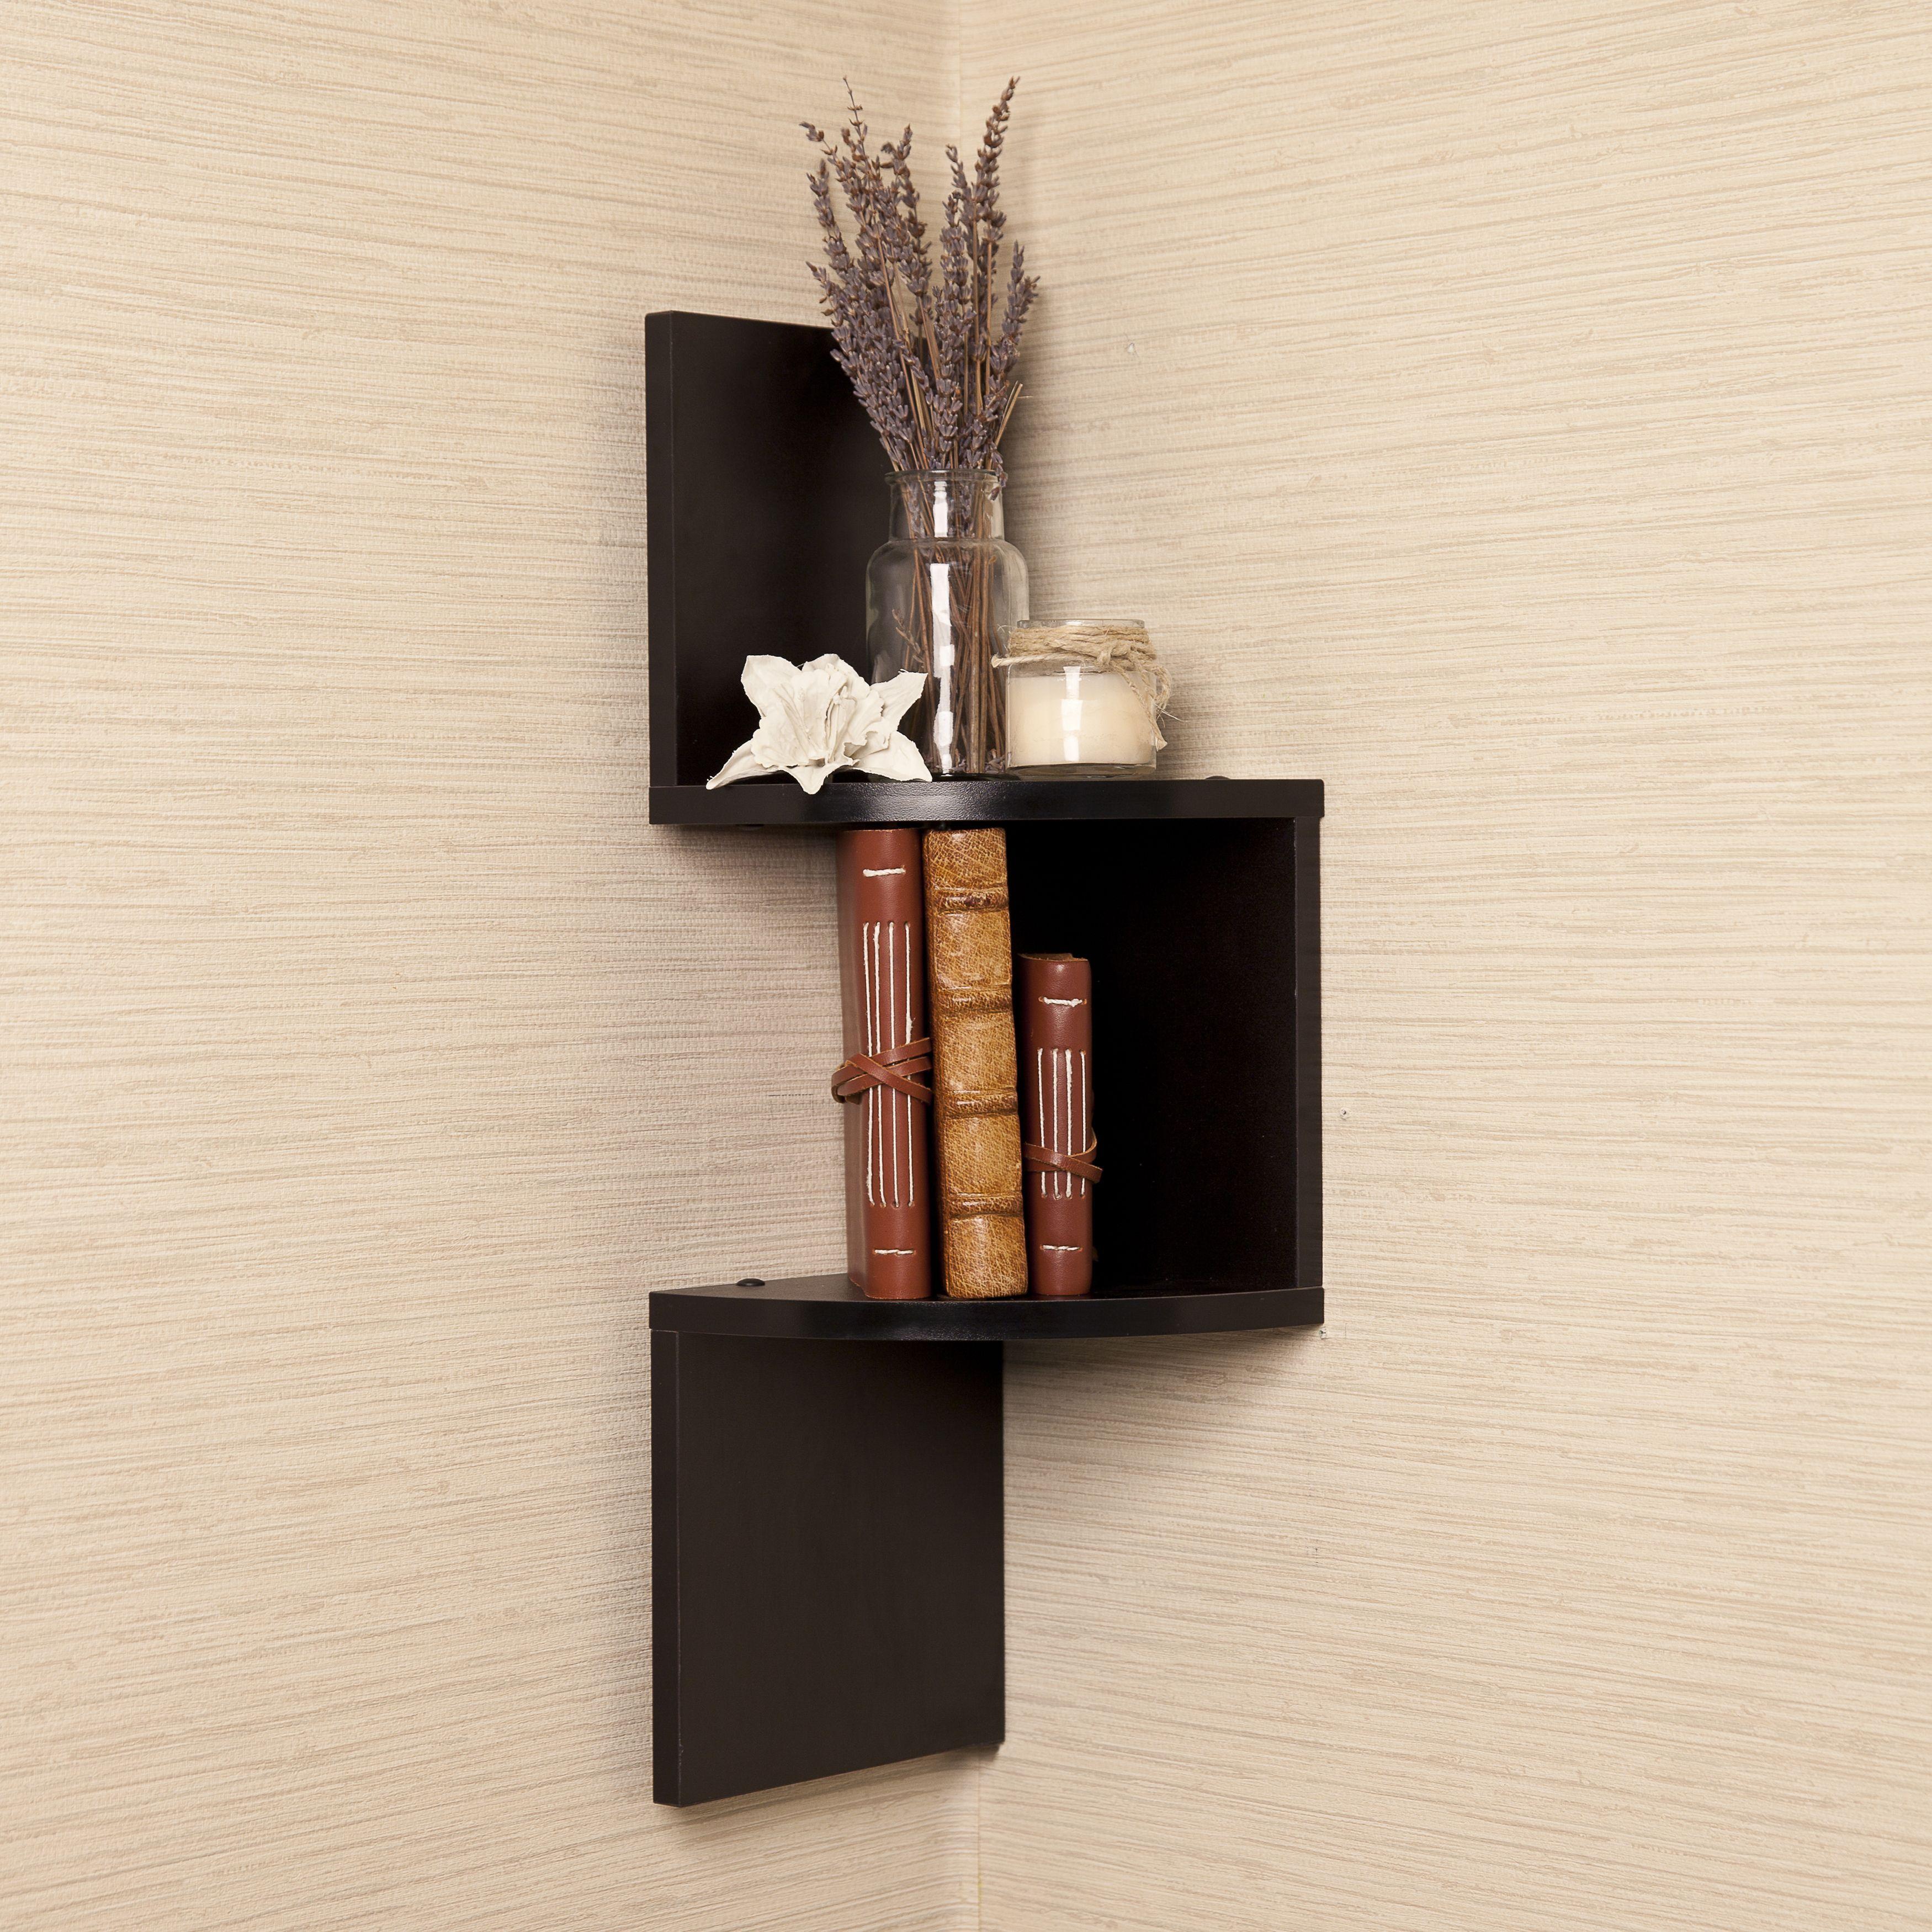 Zig Zag Design Laminated Wooden Corner Wall Shelf Black Corner Shelves Wall Mounted Shelves Corner Wall Shelves